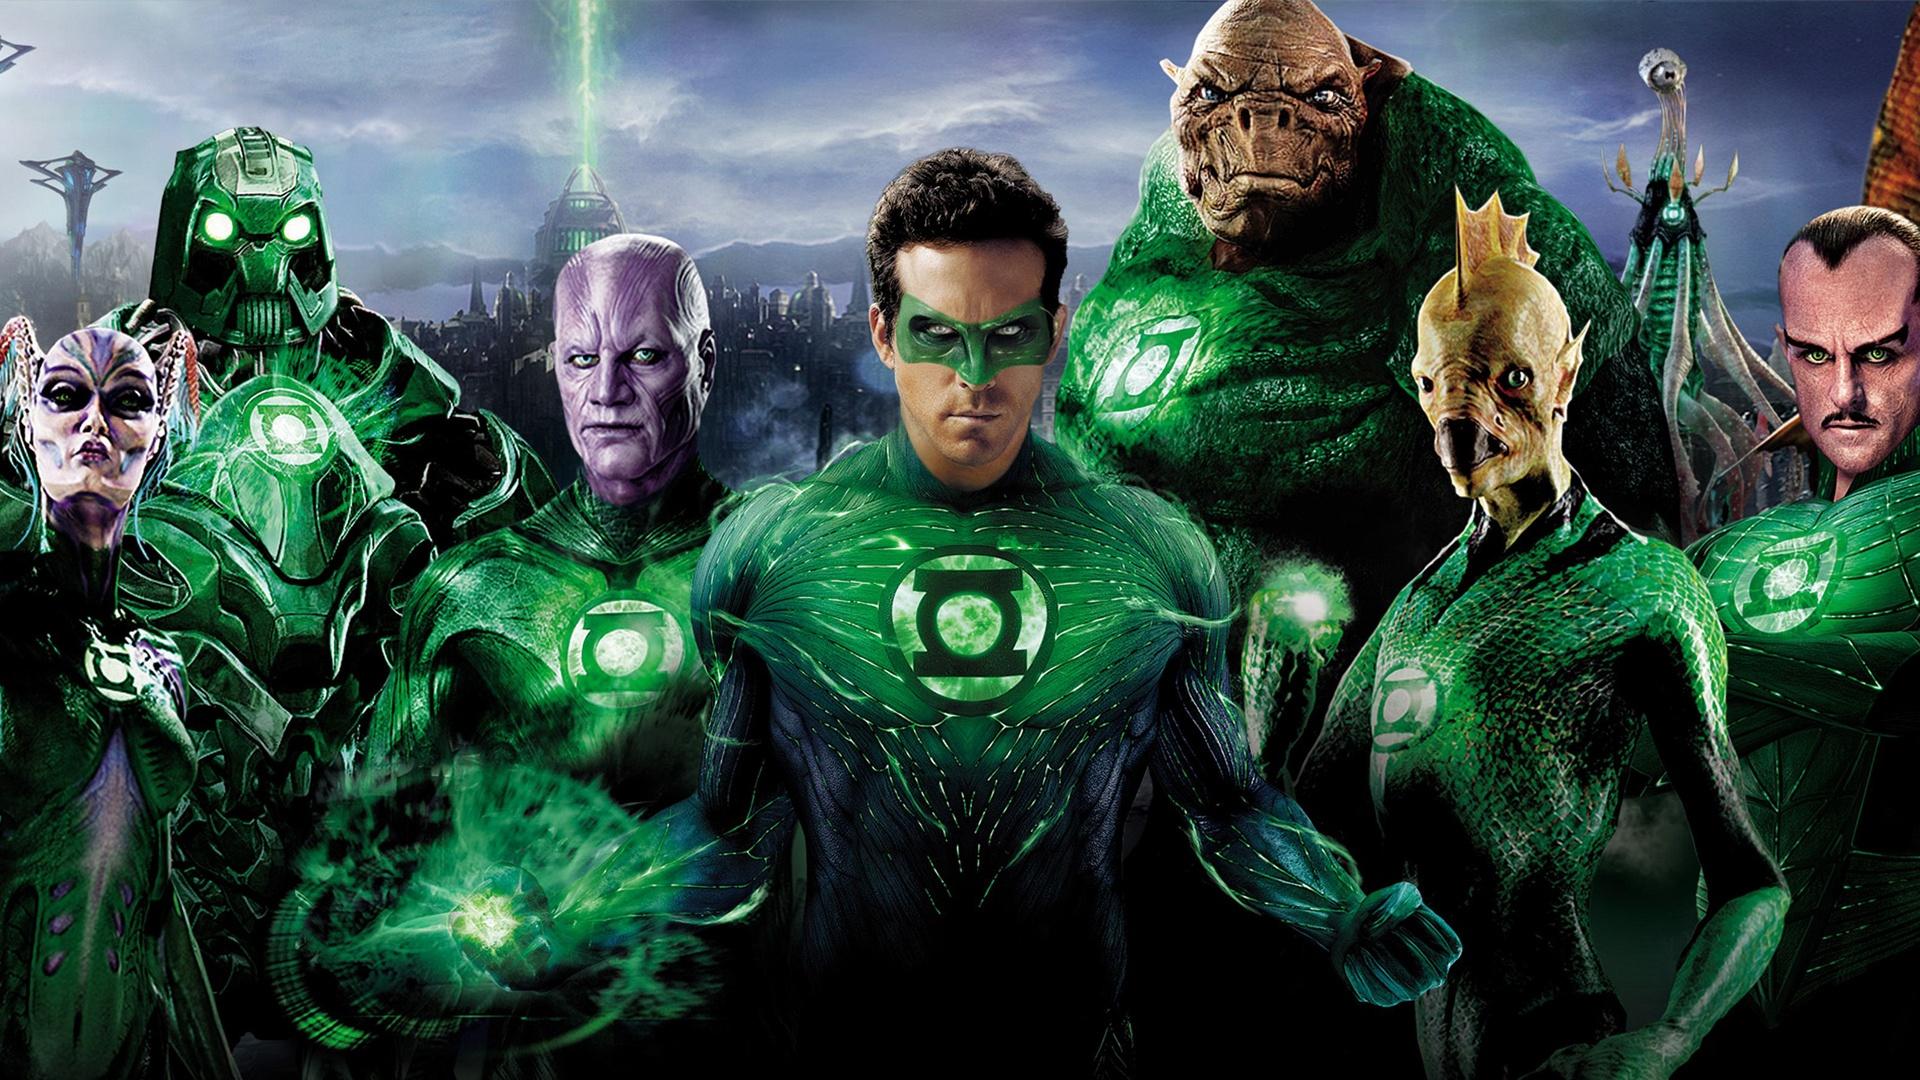 Green Lantern Movie 23543 1920x1080px 1920x1080